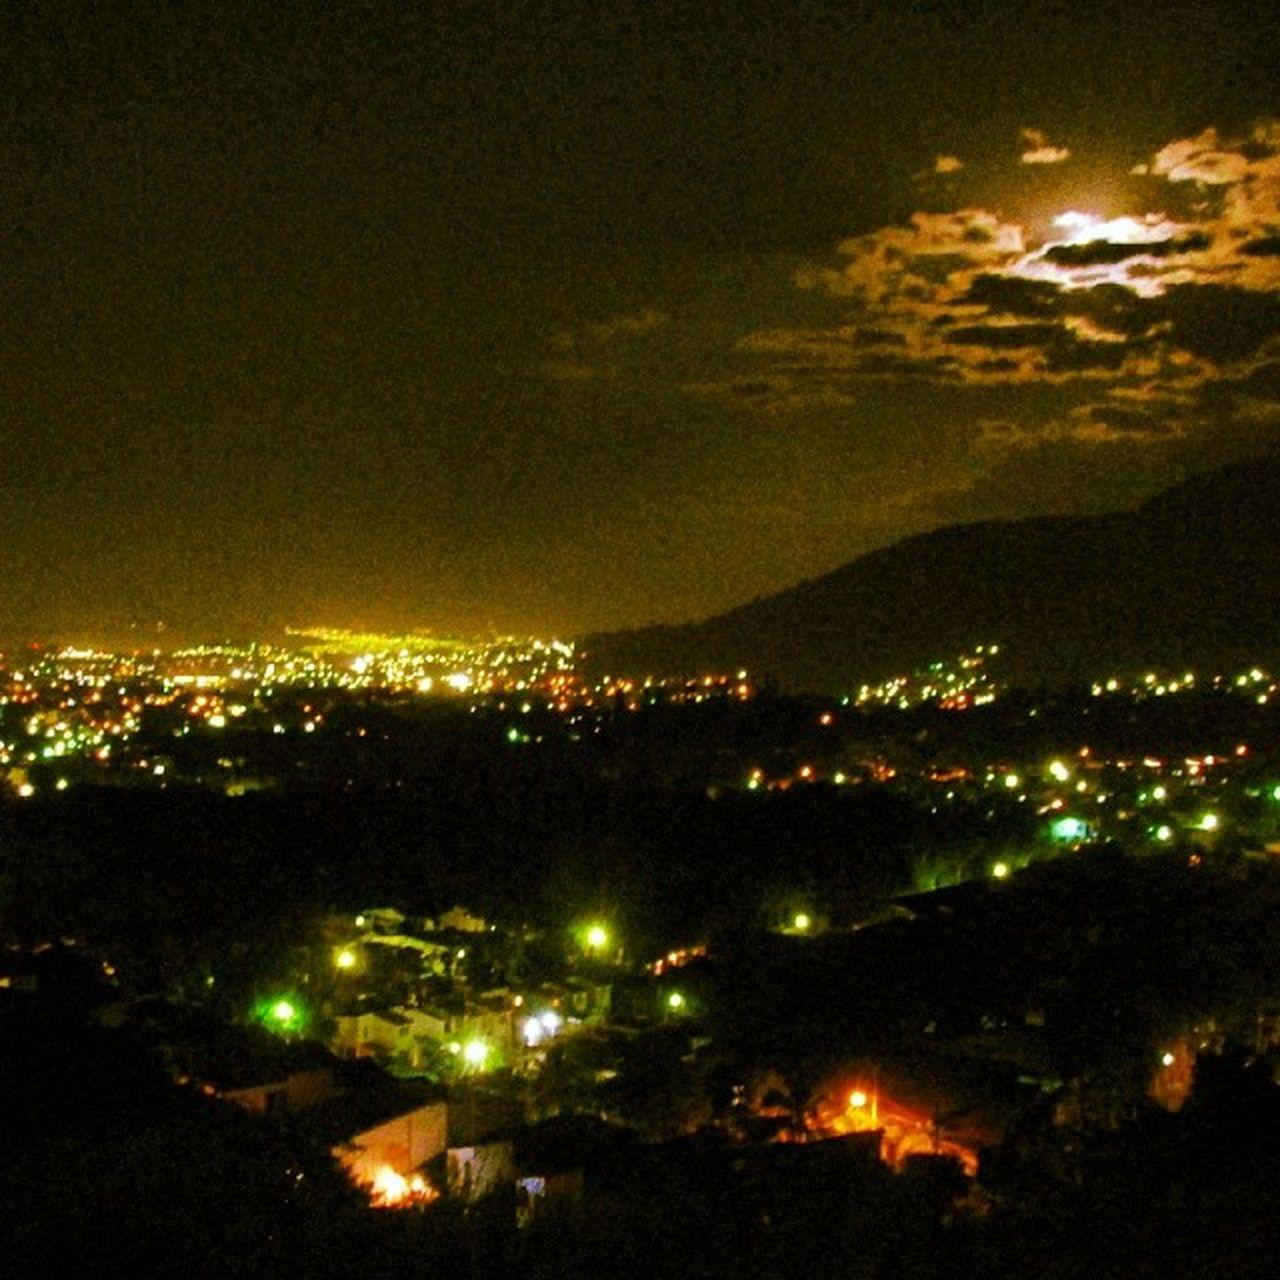 night, illuminated, cityscape, sky, no people, city, nature, outdoors, beauty in nature